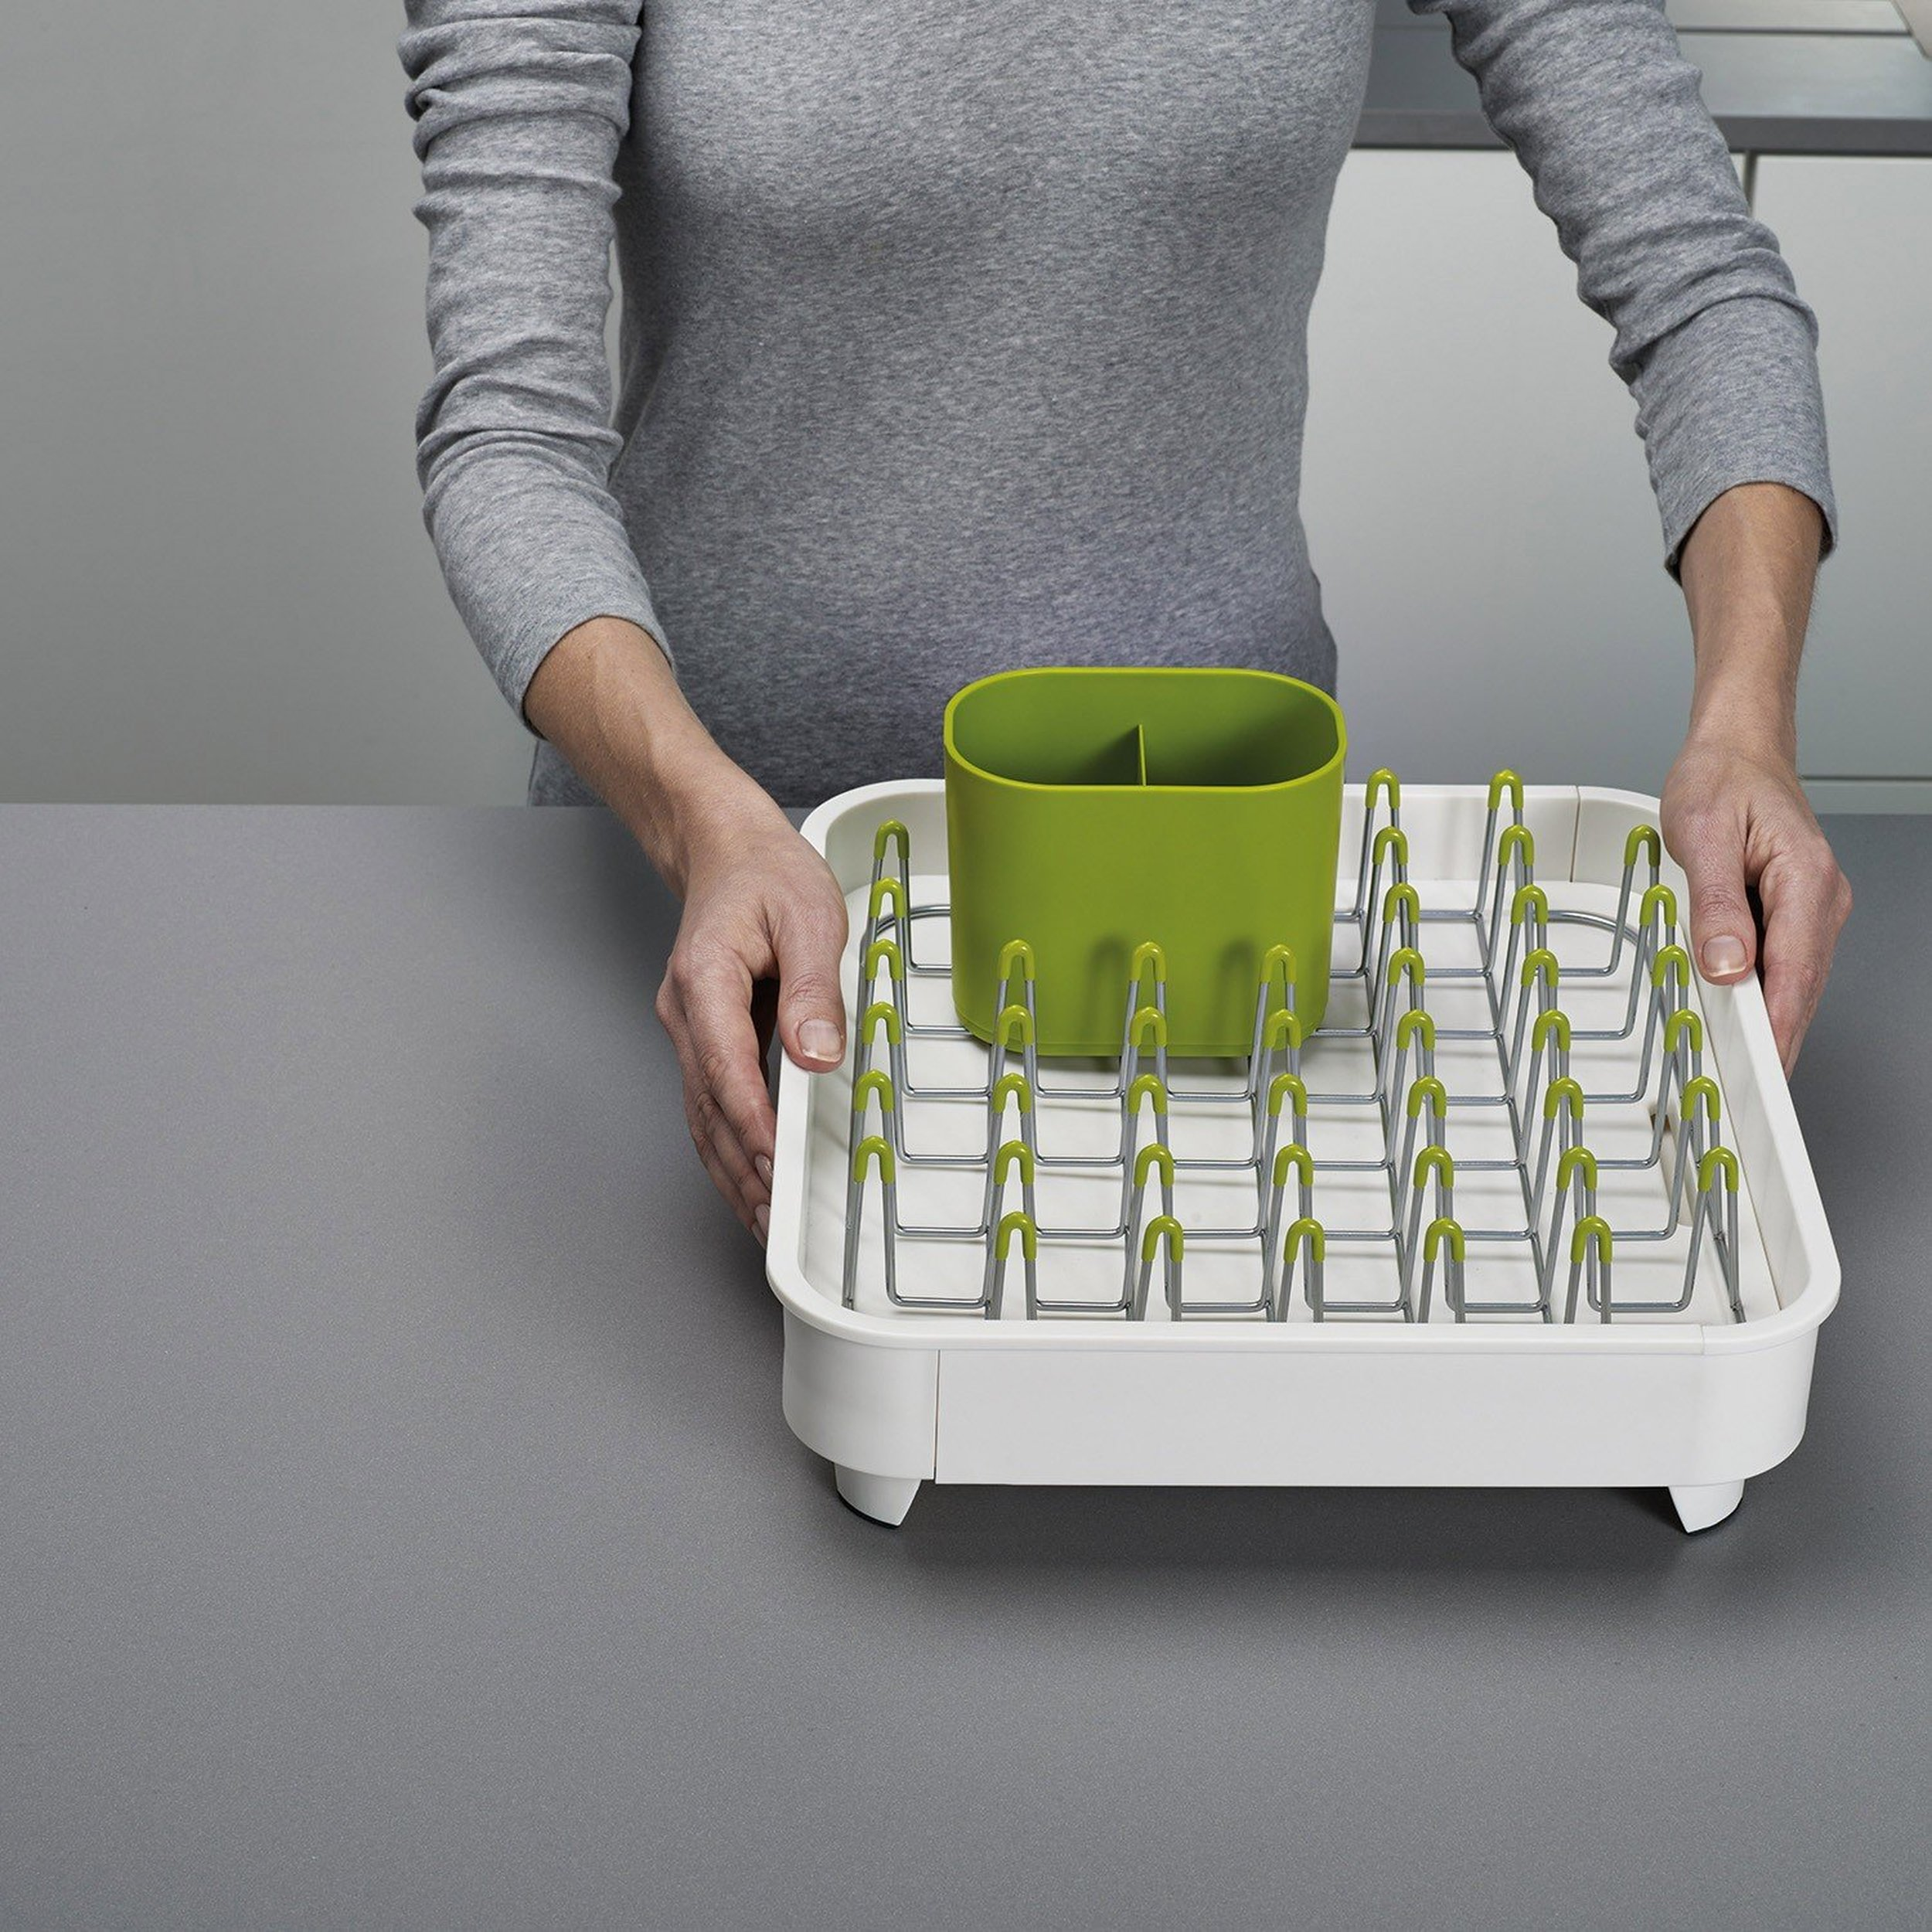 suszarka do naczy extend joseph joseph studio17 design ff. Black Bedroom Furniture Sets. Home Design Ideas